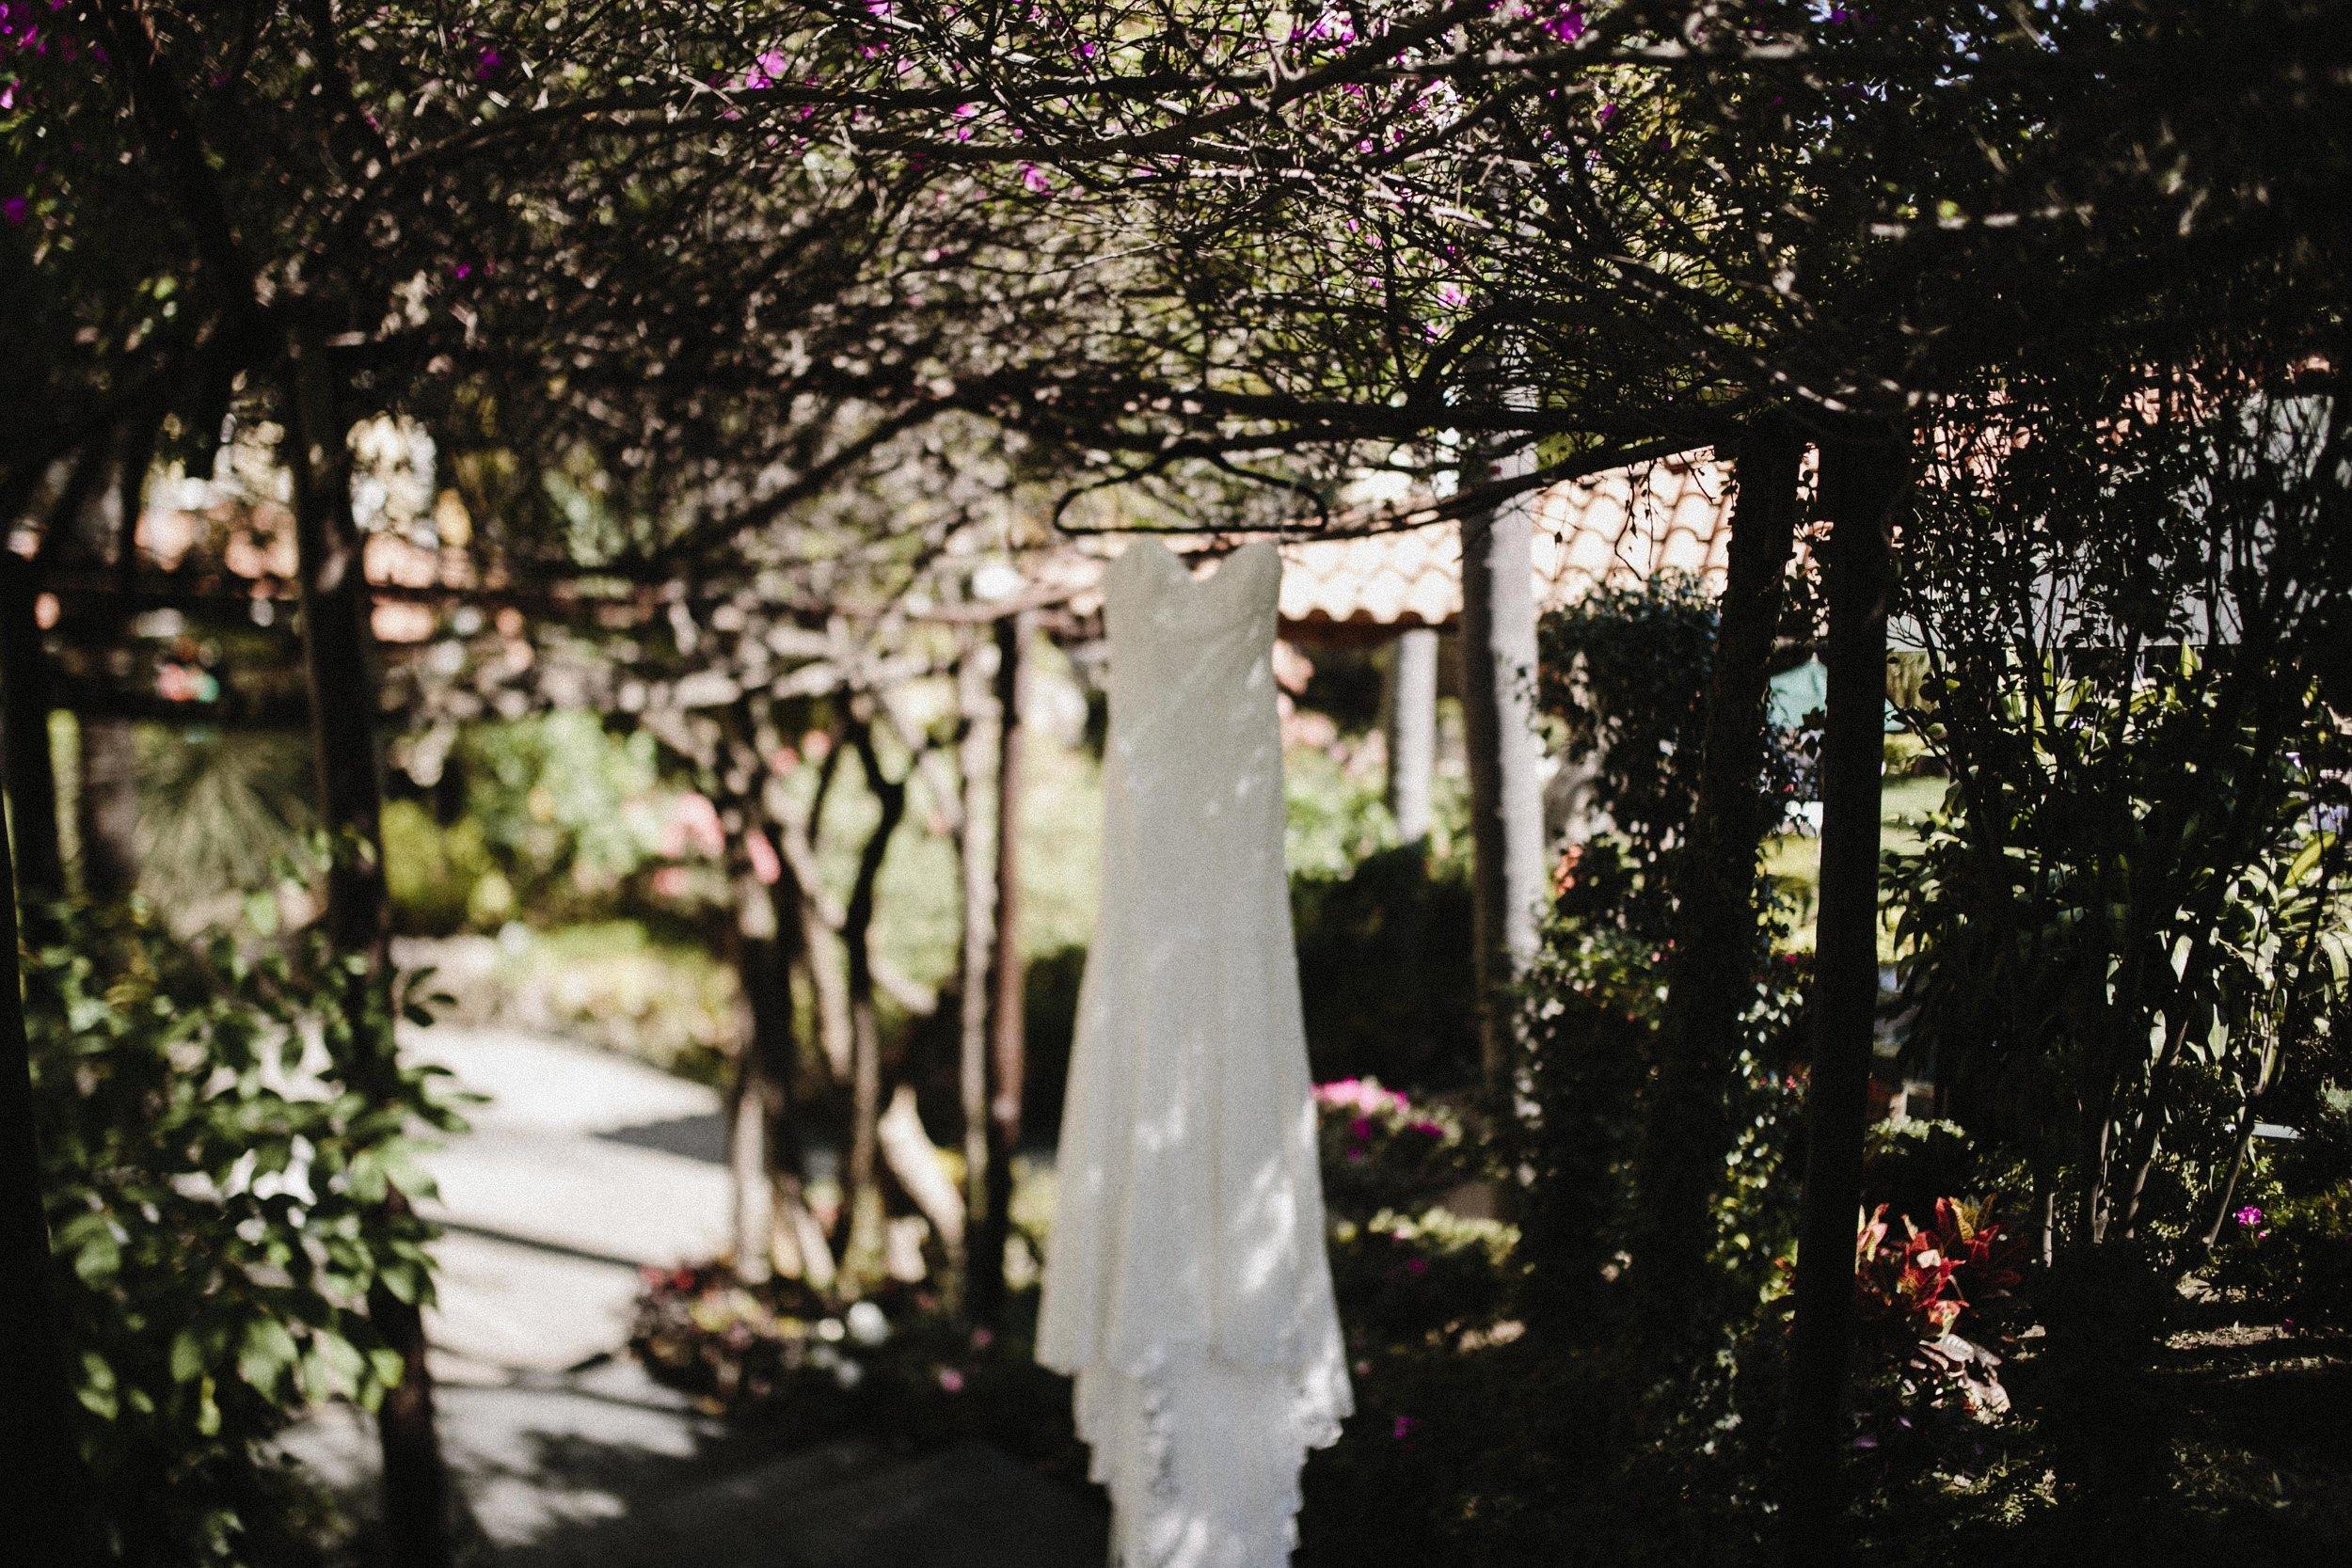 alfonso_flores_destination_wedding_photography_jardin_amarello_cuernavaca13.jpg